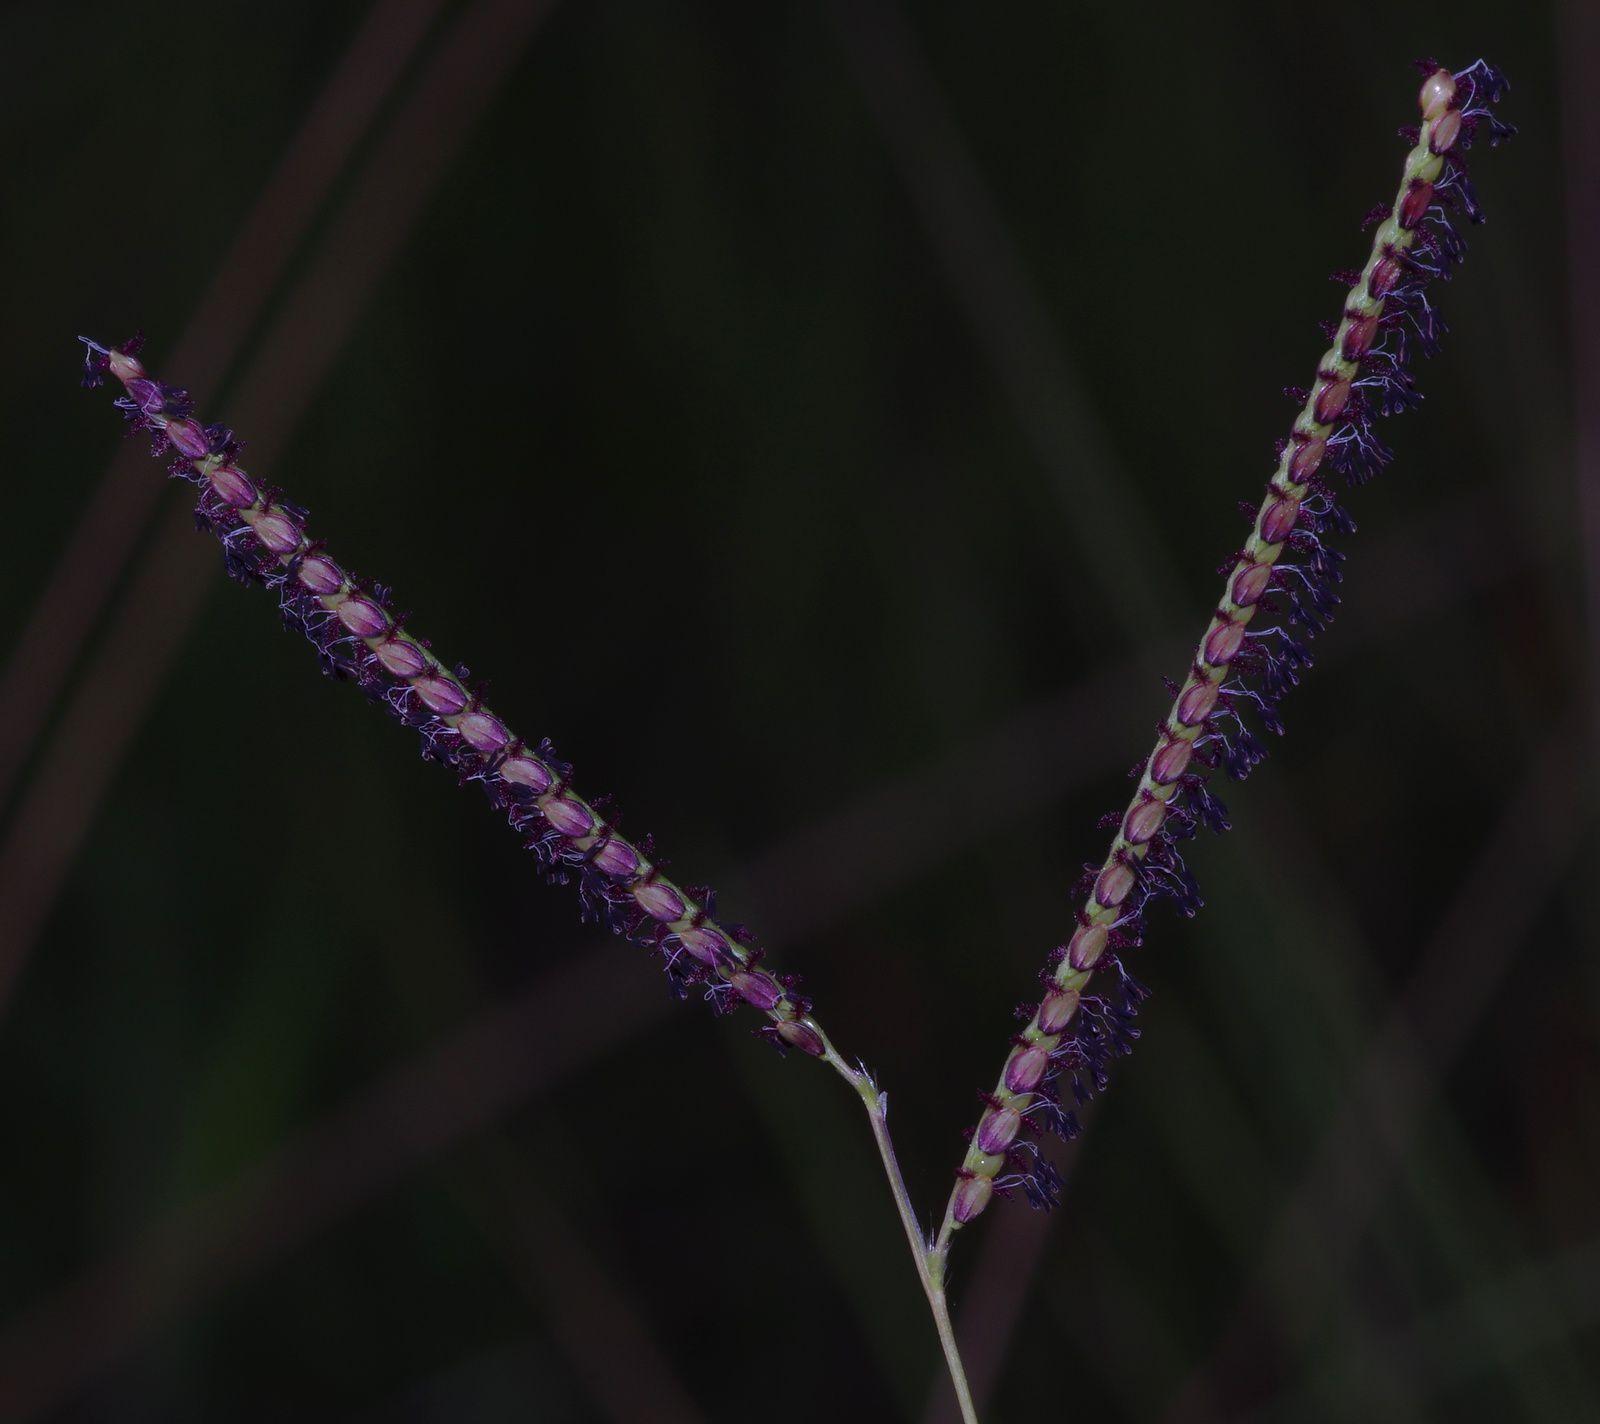 Paspalum pulchellum